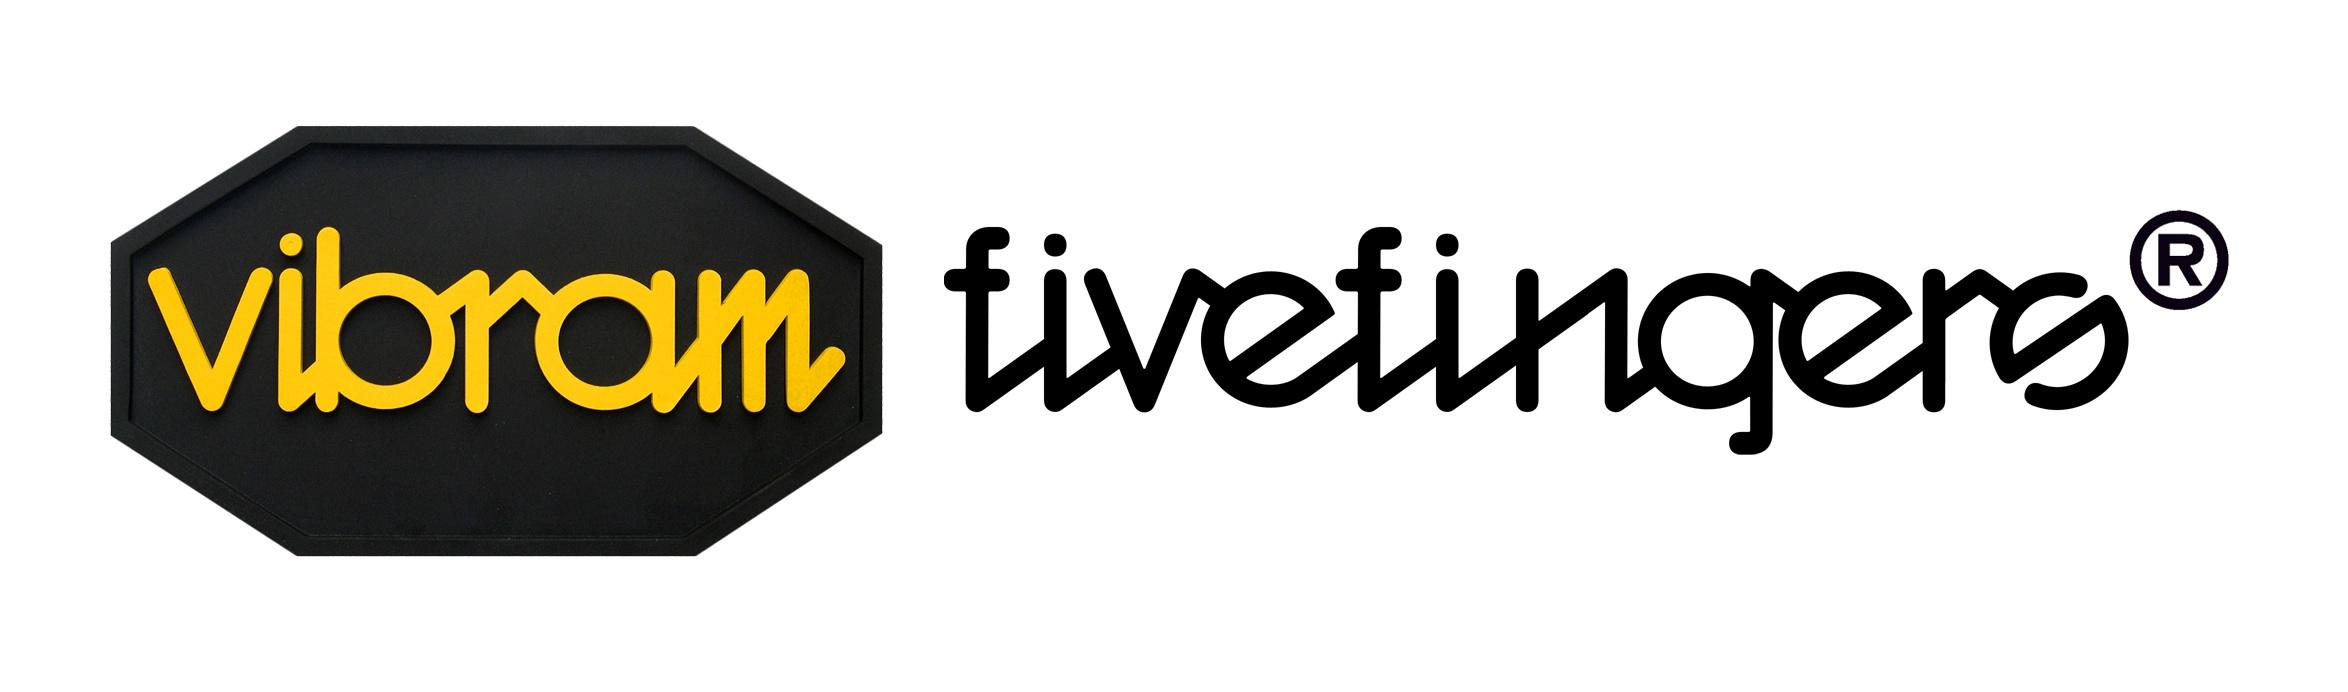 Logo Vibram Fivefingers